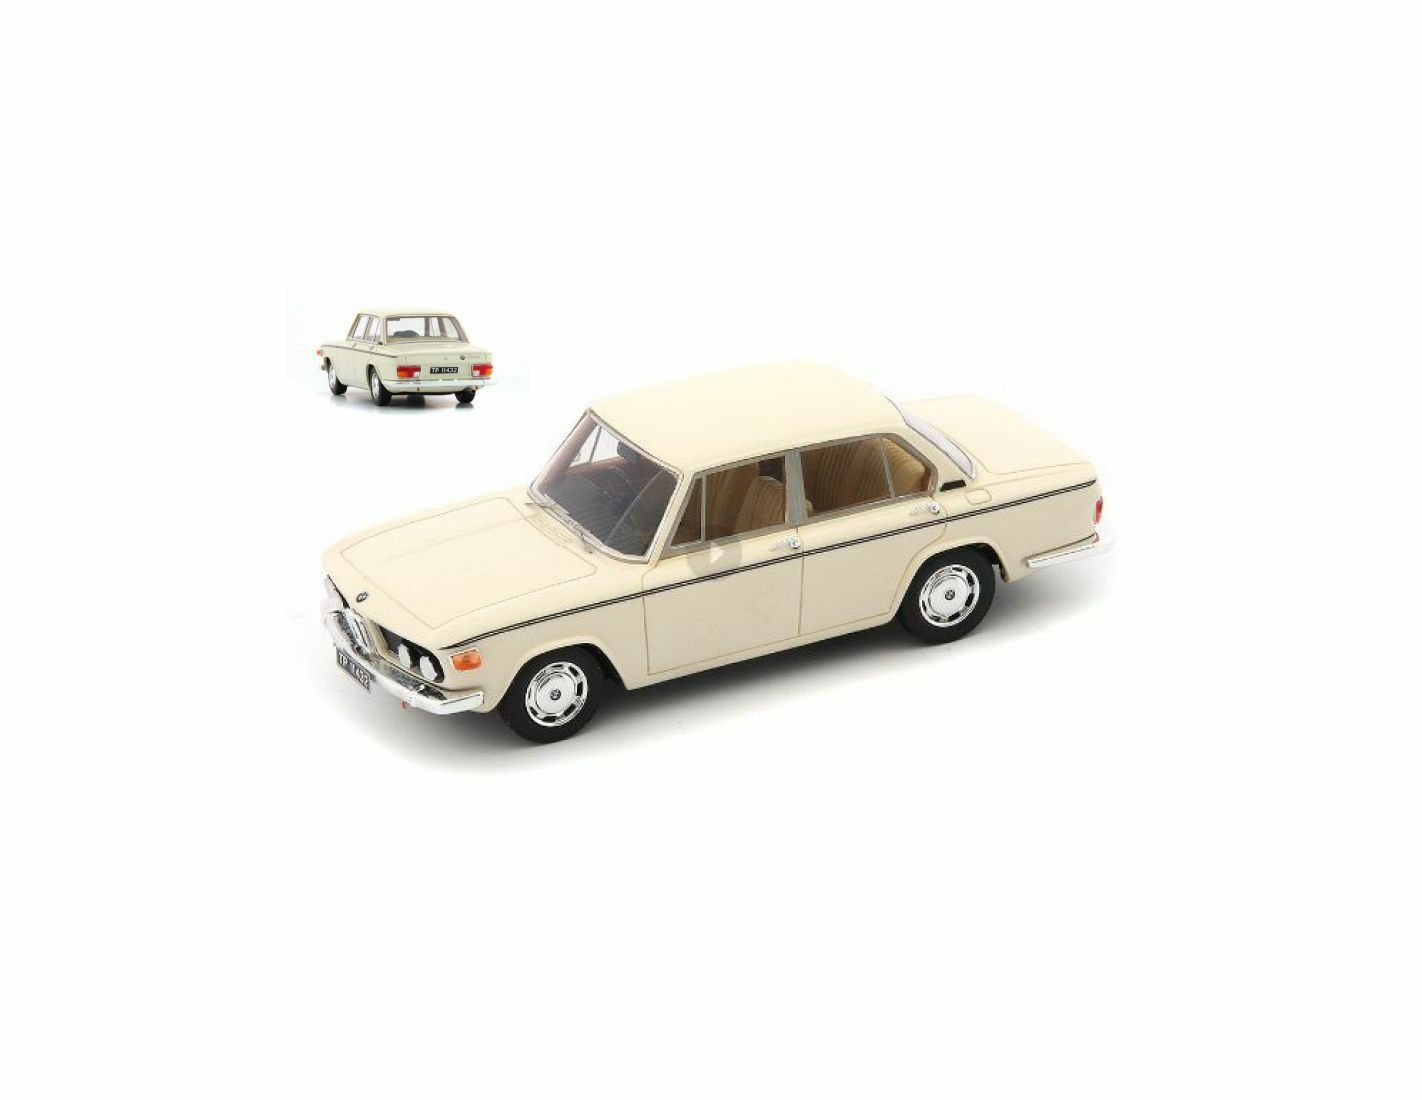 Autocult ATC05022 BMW 2004M LIMOUSINE 1973 BEIGE 1 43 Modellino